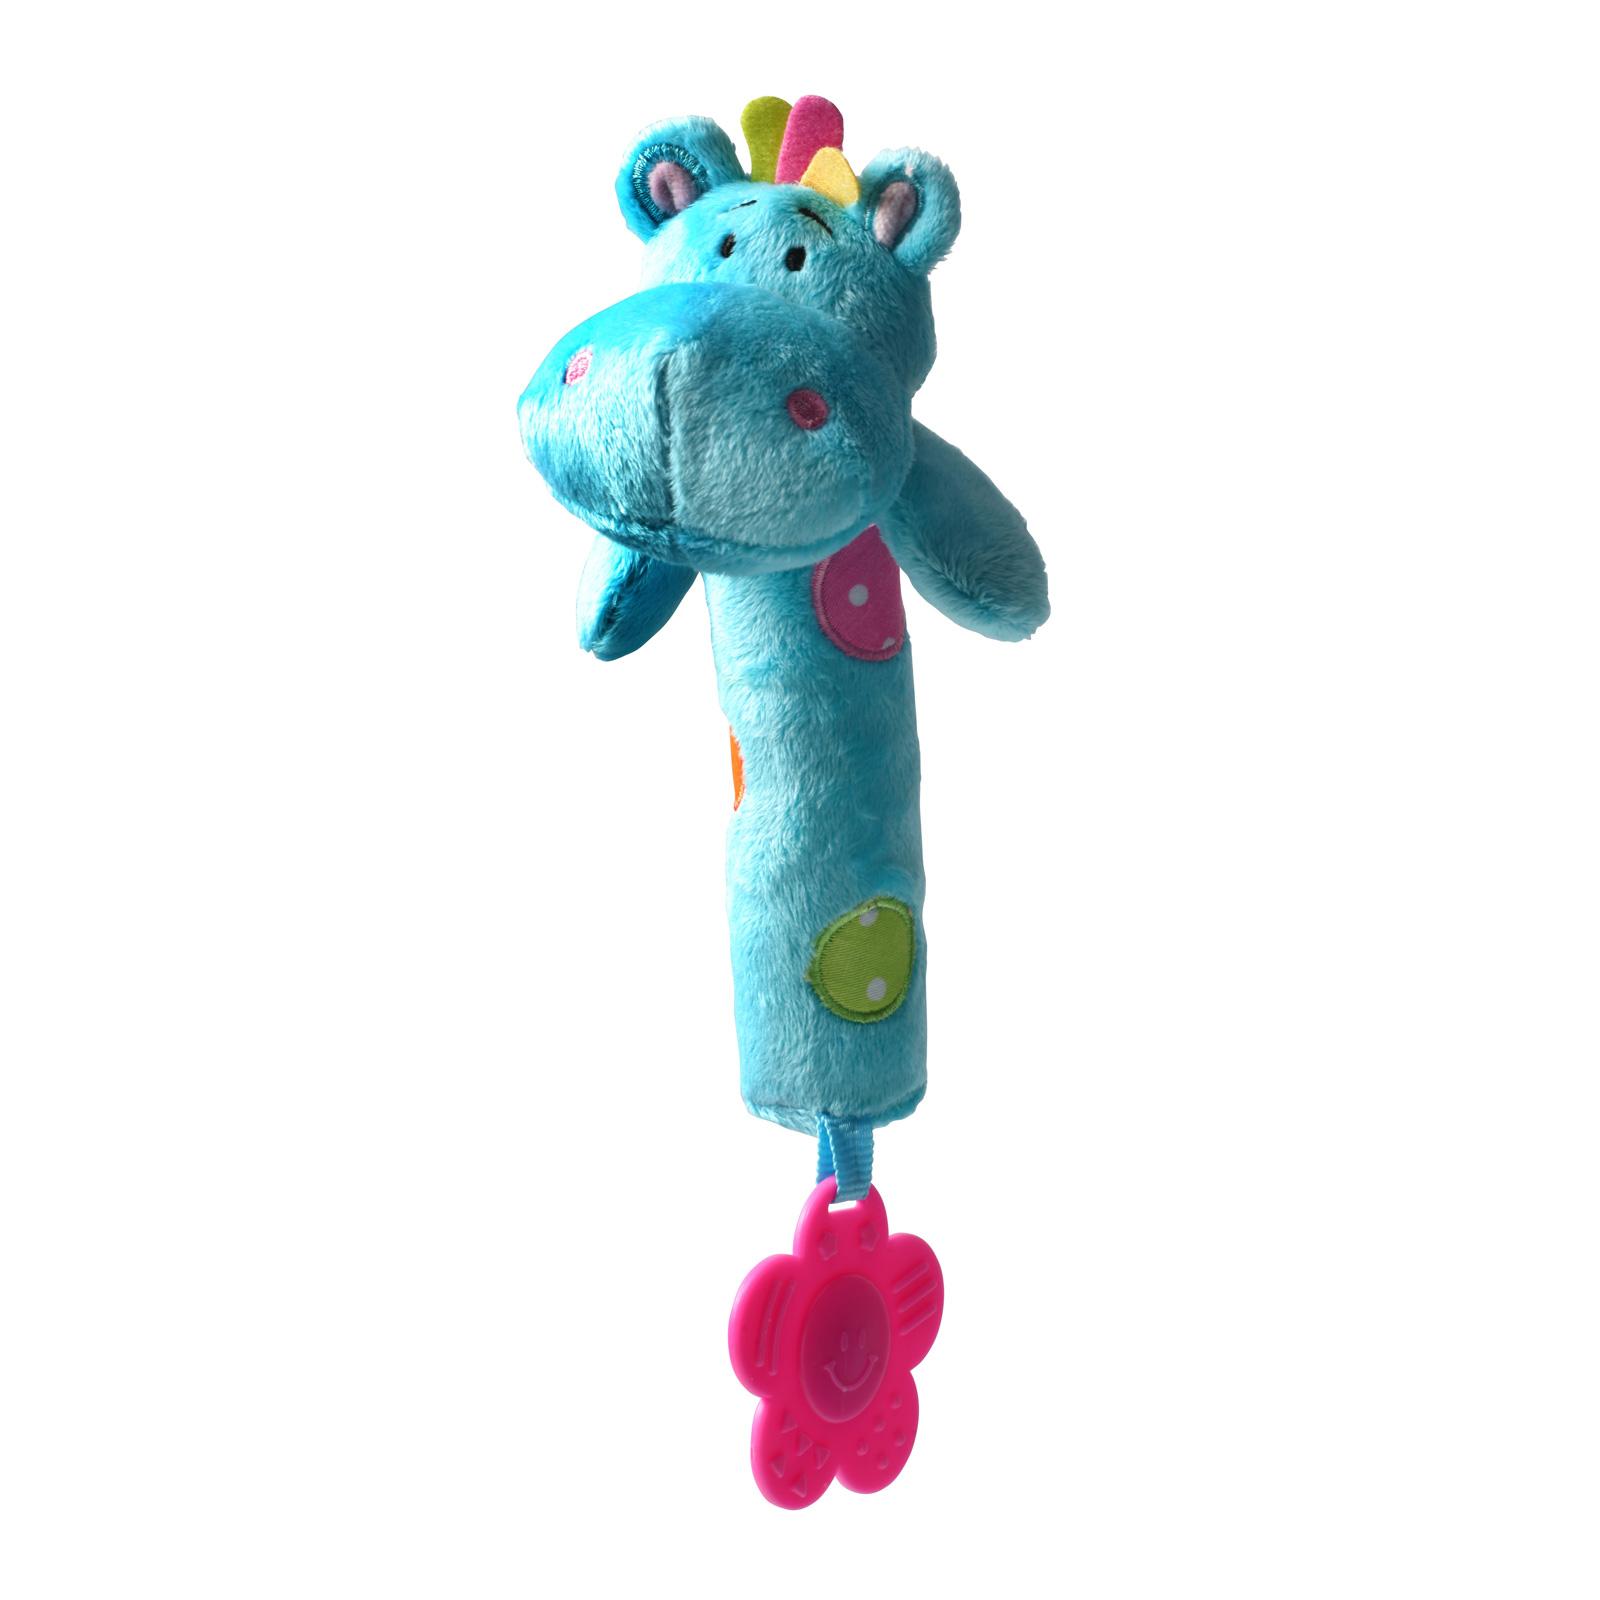 Игрушка-пищалка BabyOno Бегемотик с прорезывателем<br>